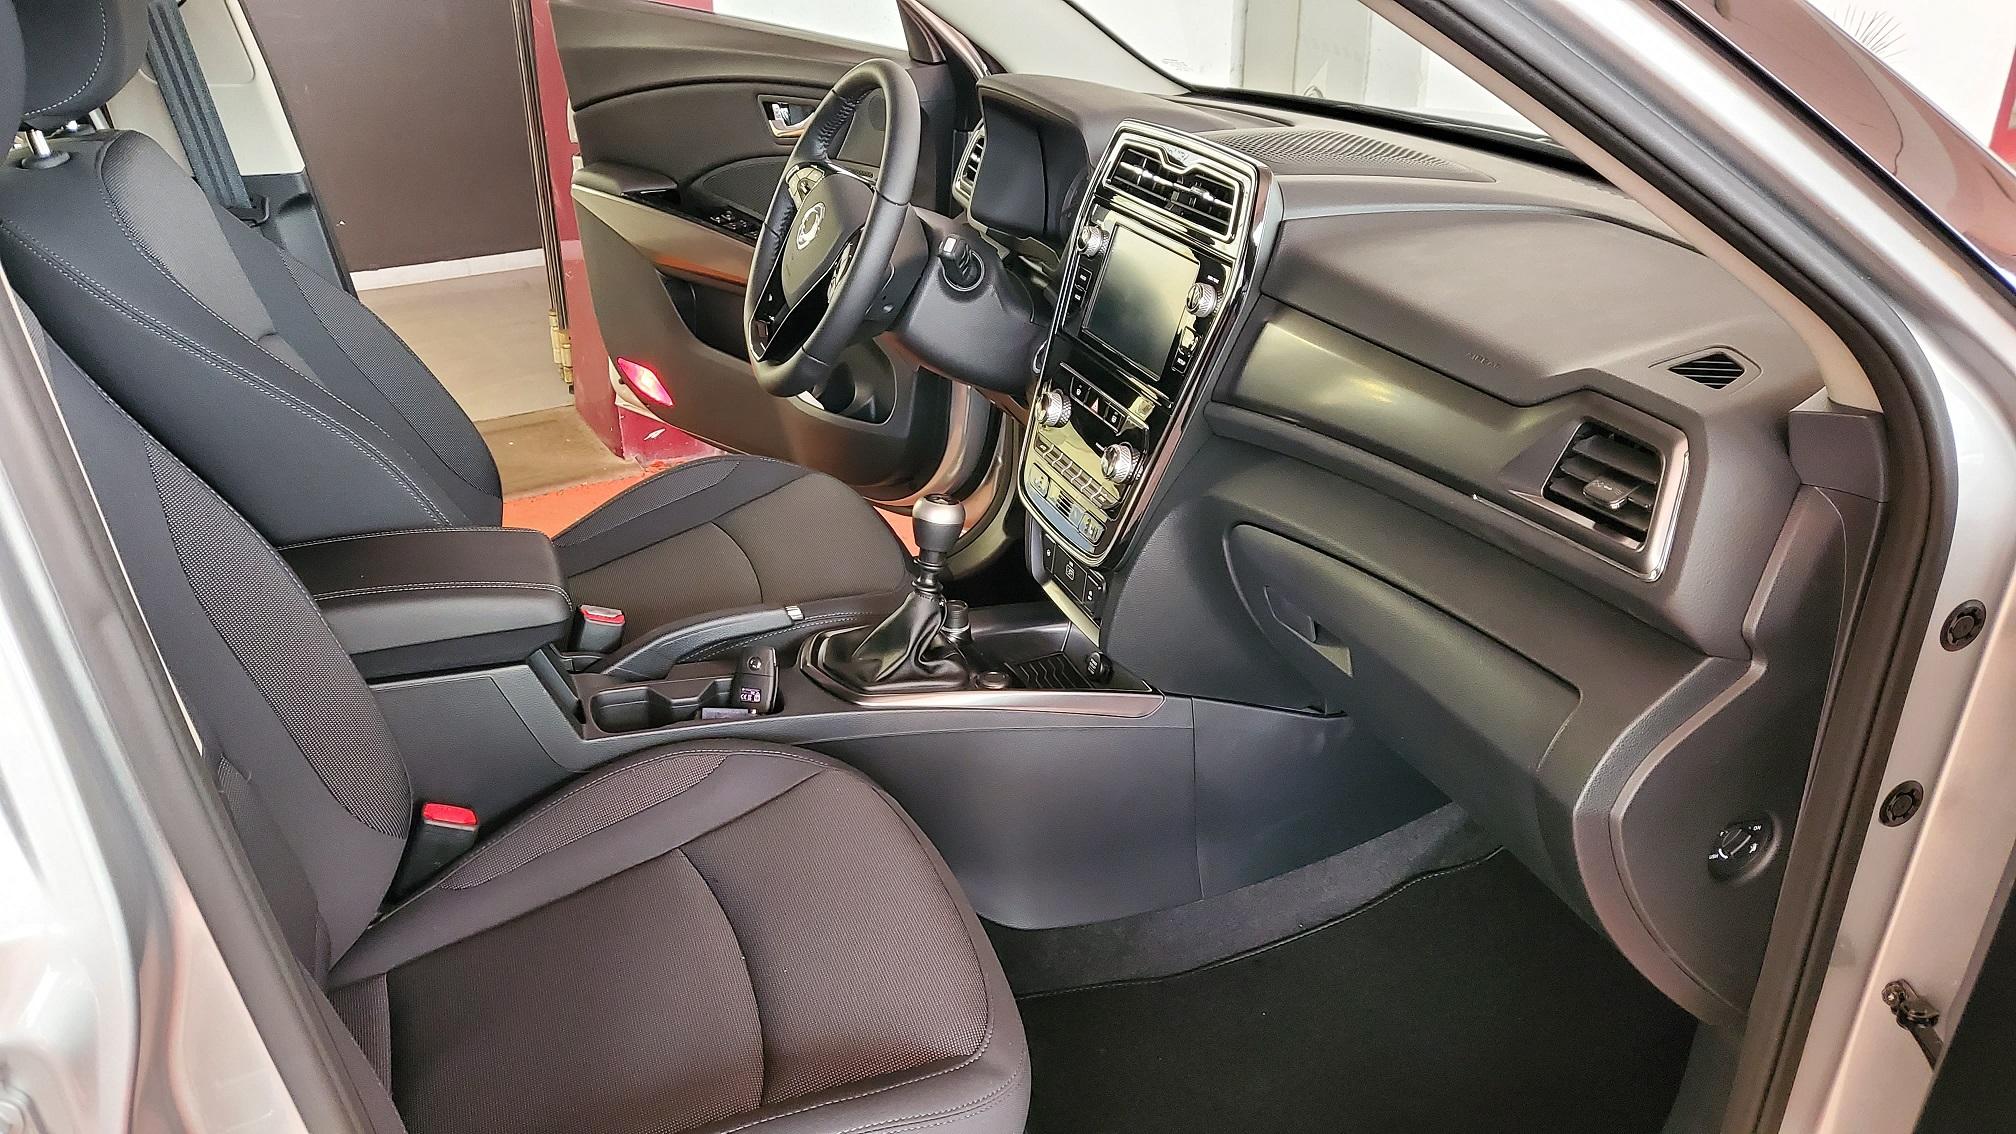 SSANGYONG Tivoli 1.6 diesel 2WD Comfort Diesel usata - 8